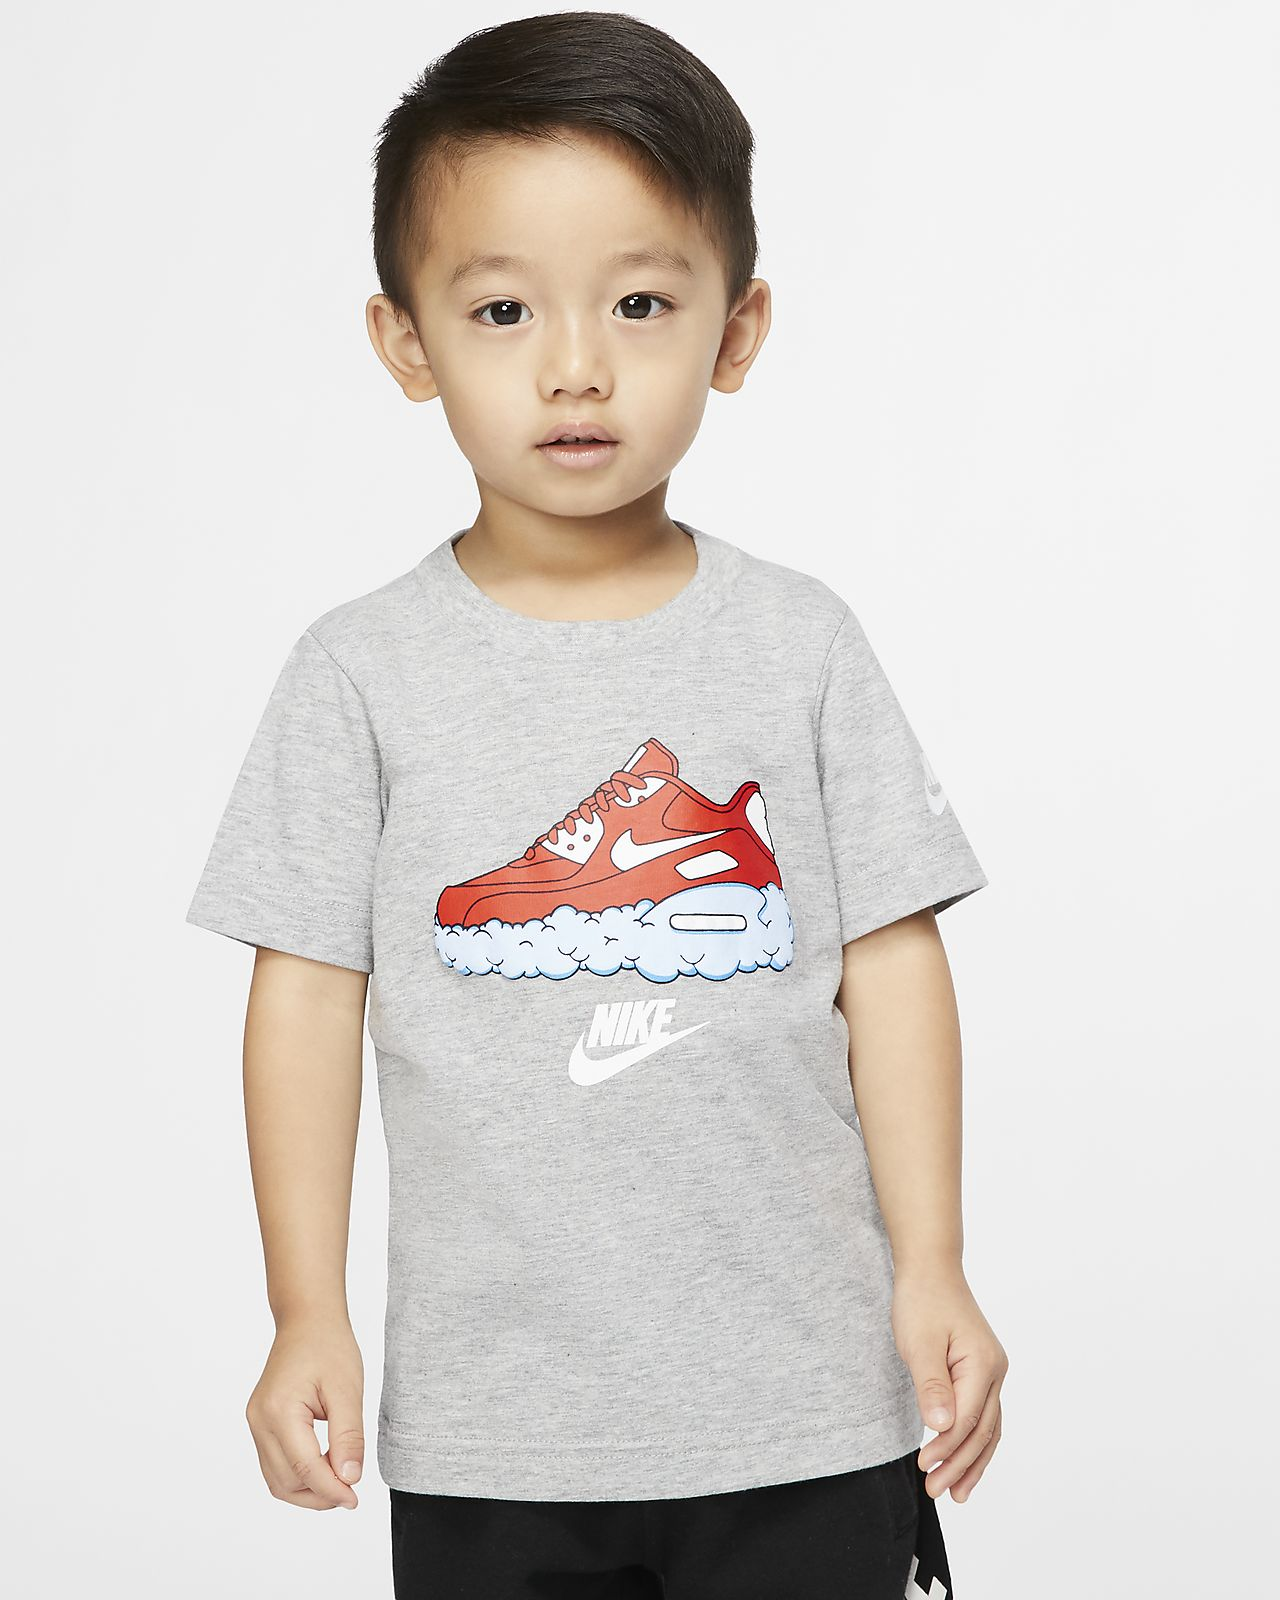 Nike Toddler Short-Sleeve T-Shirt